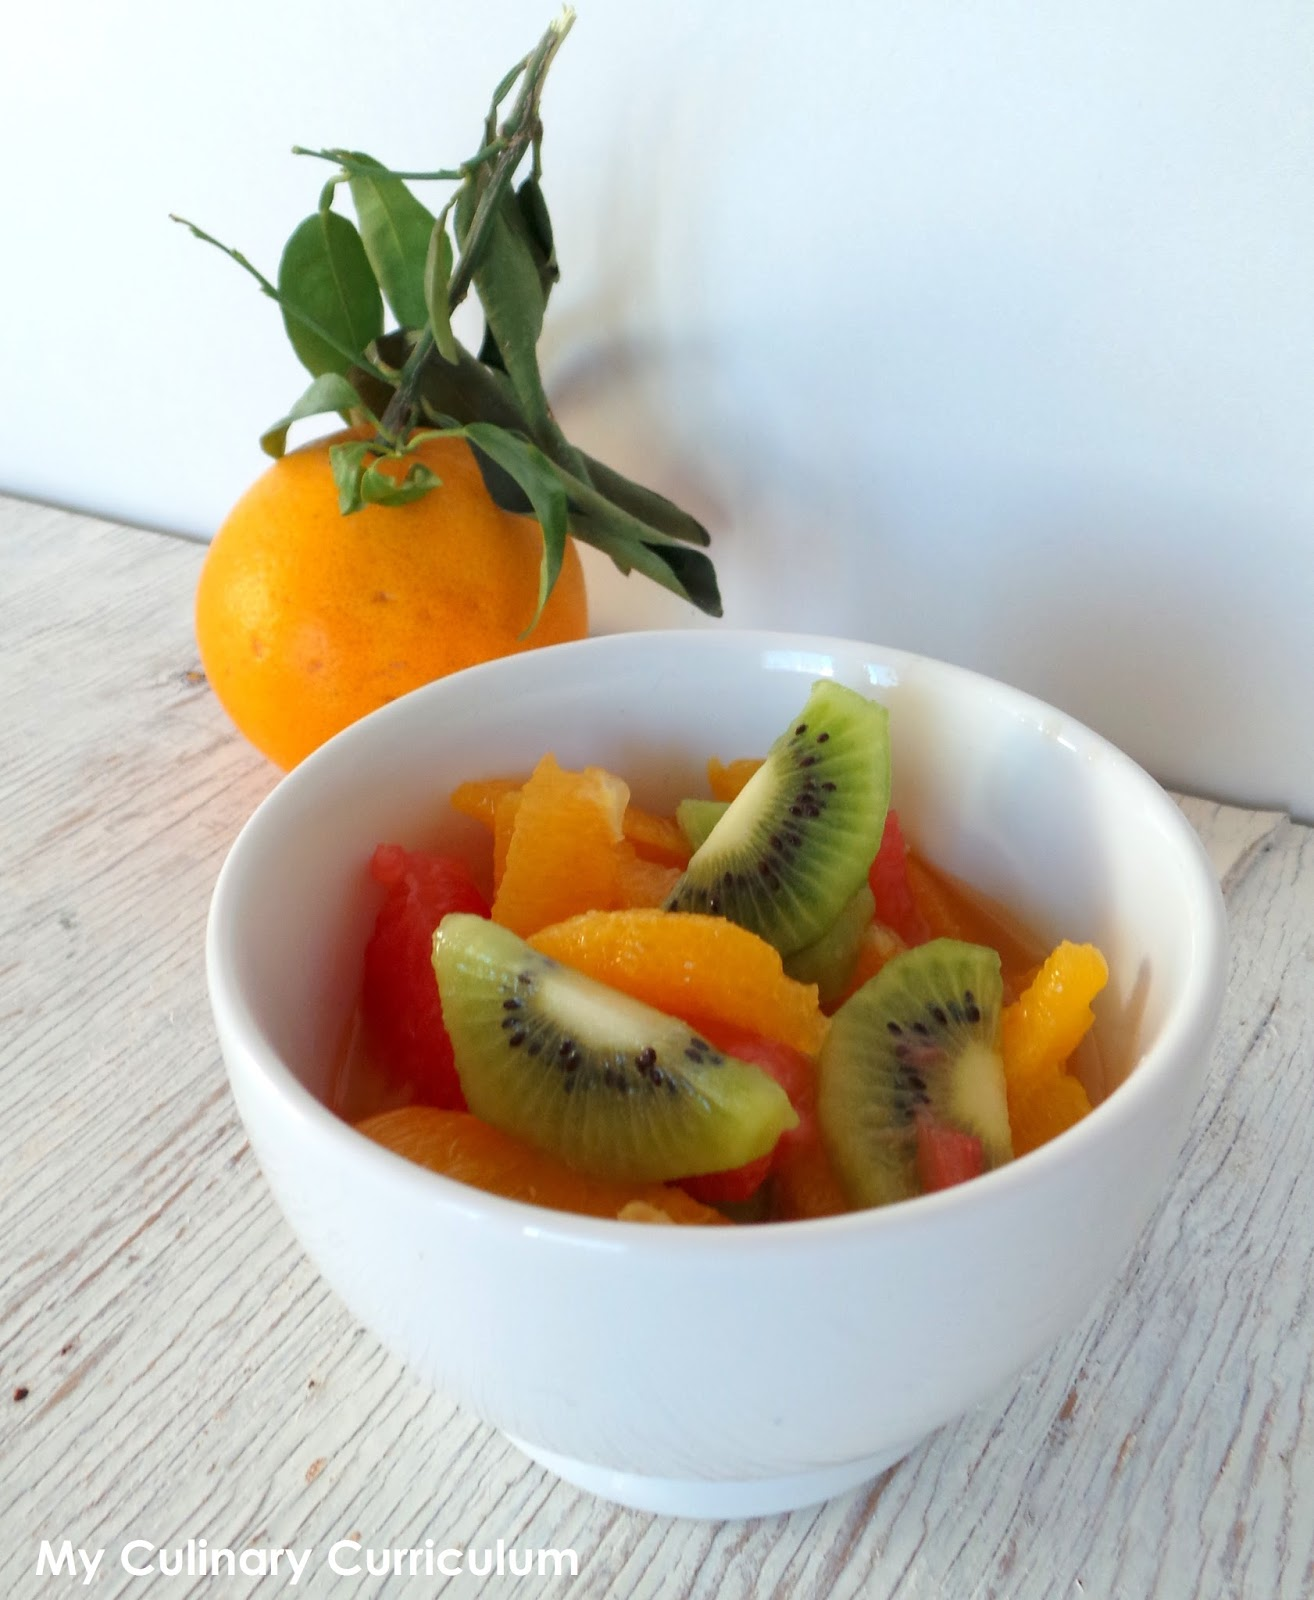 My Culinary Curriculum Salade D Oranges Pomelos Kiwis A La Fleur